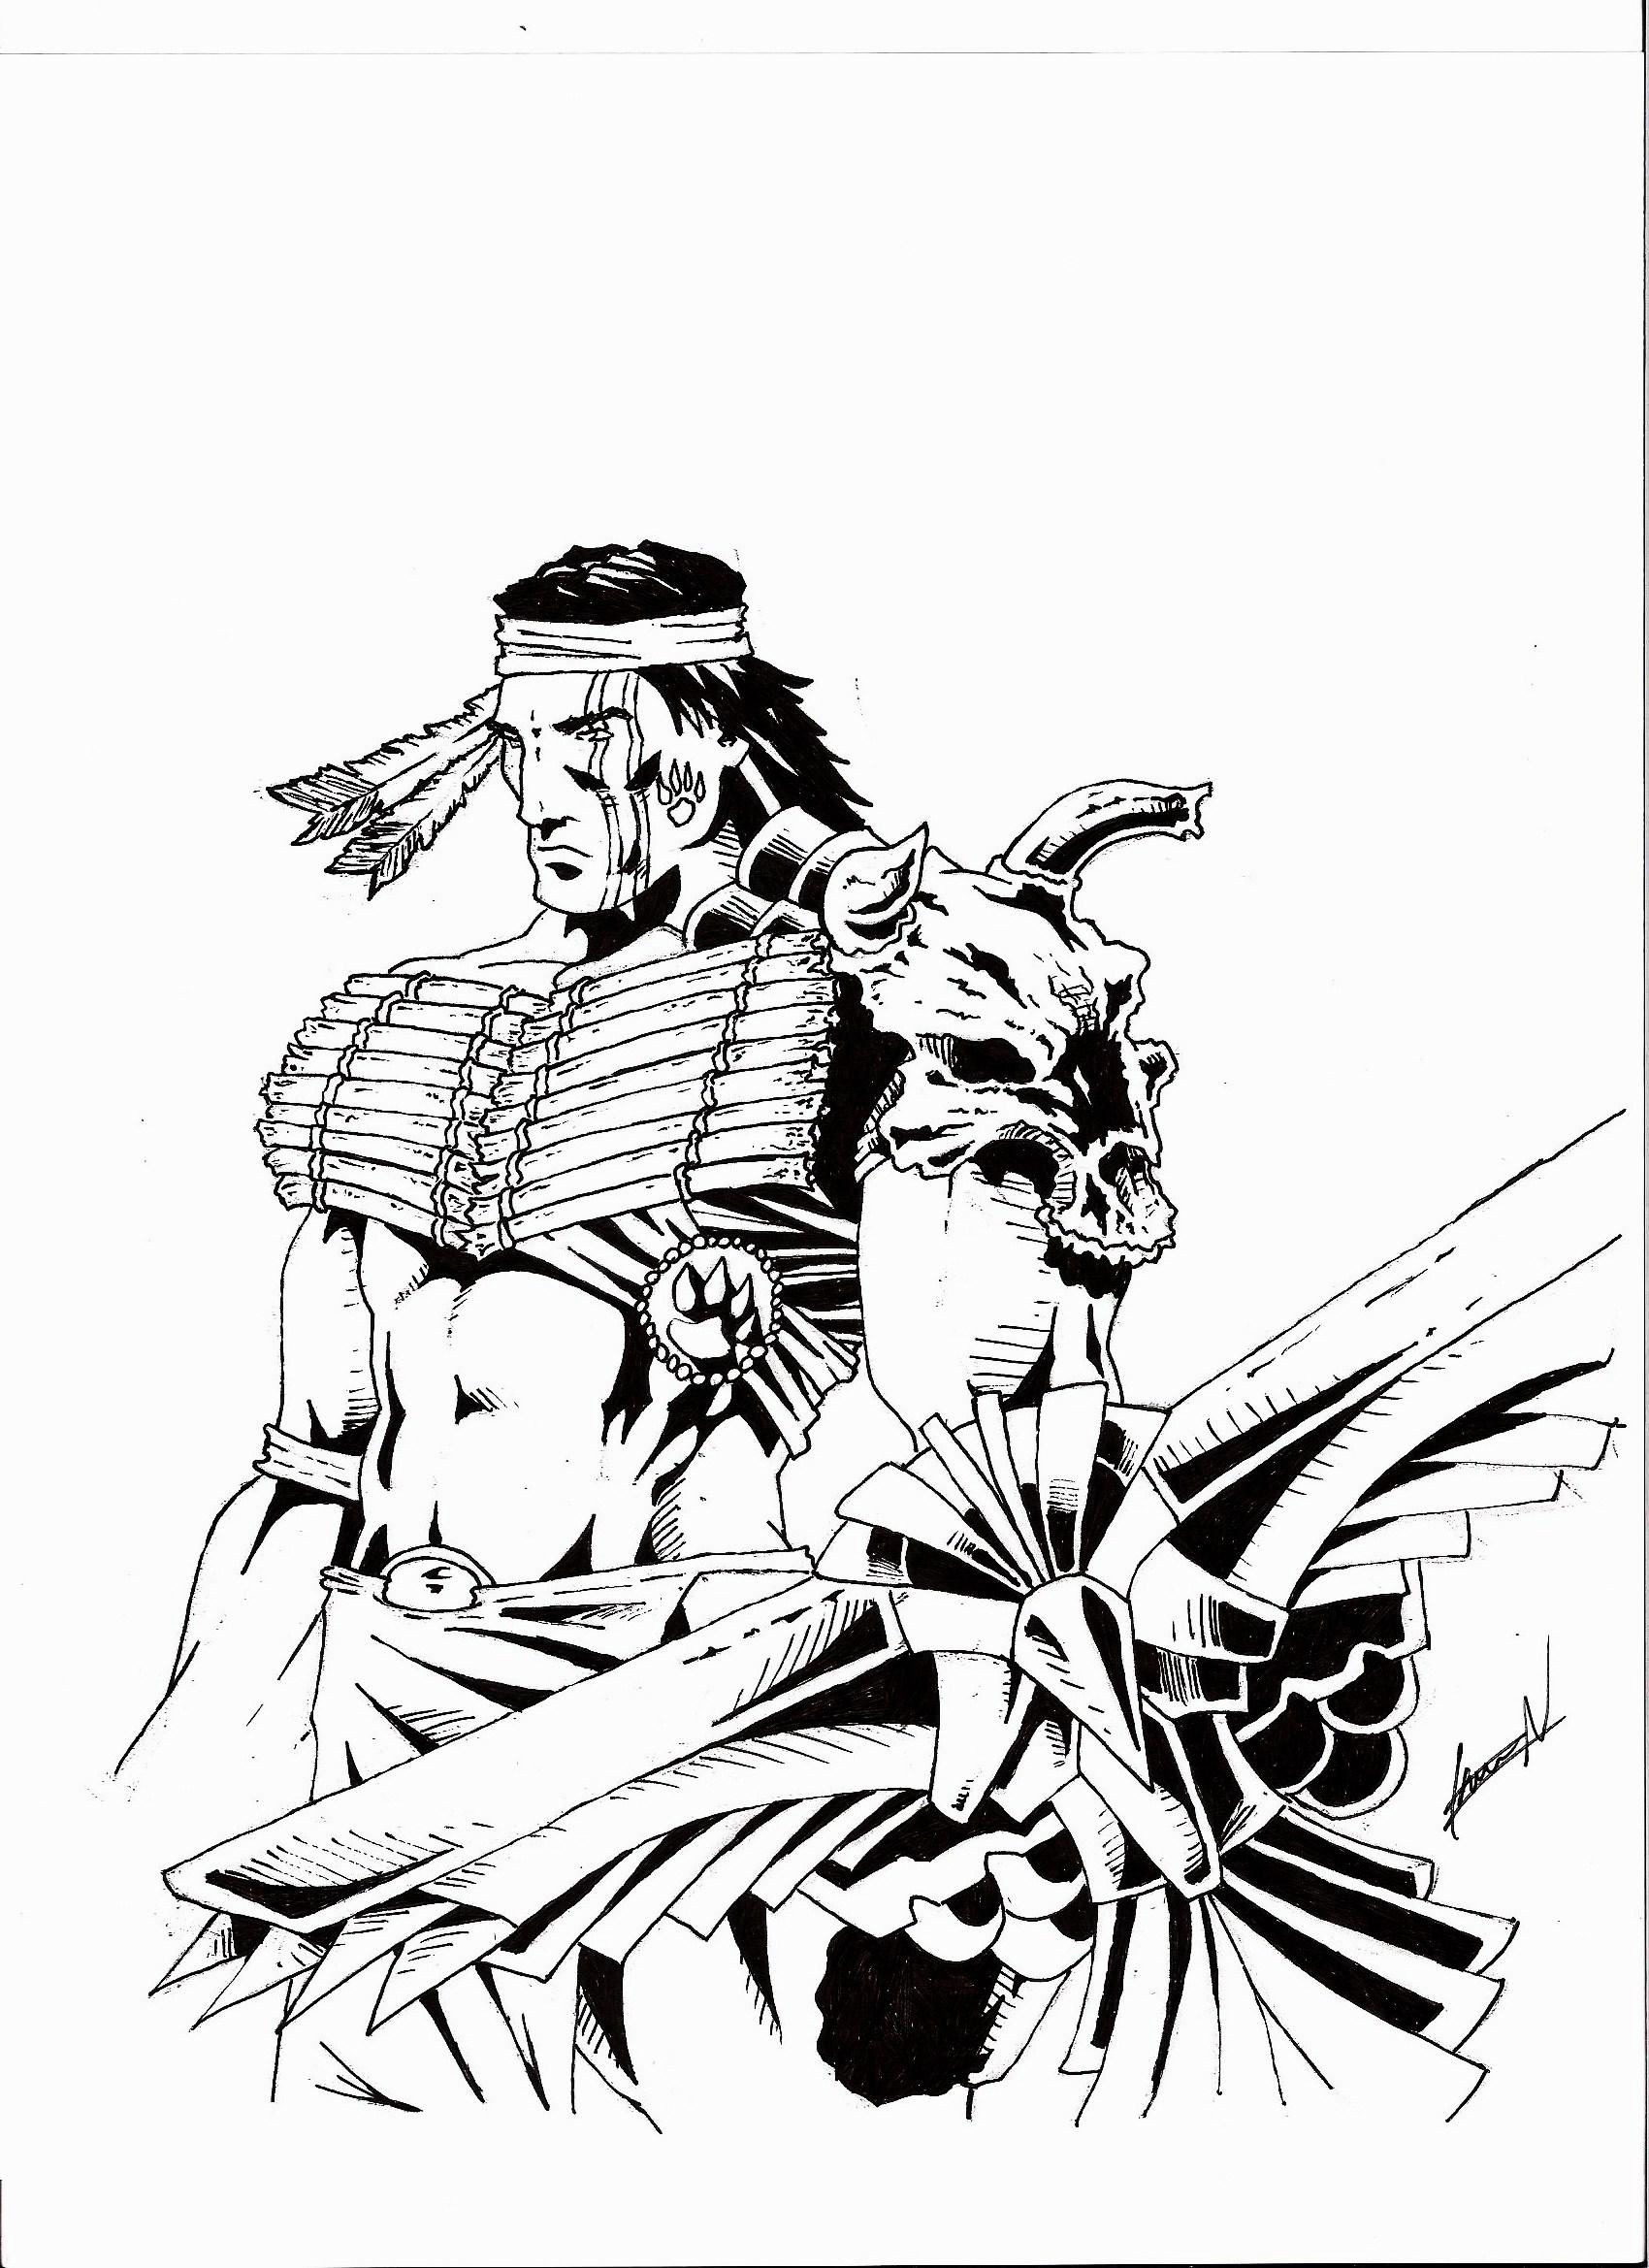 Warrior by chevronlowery